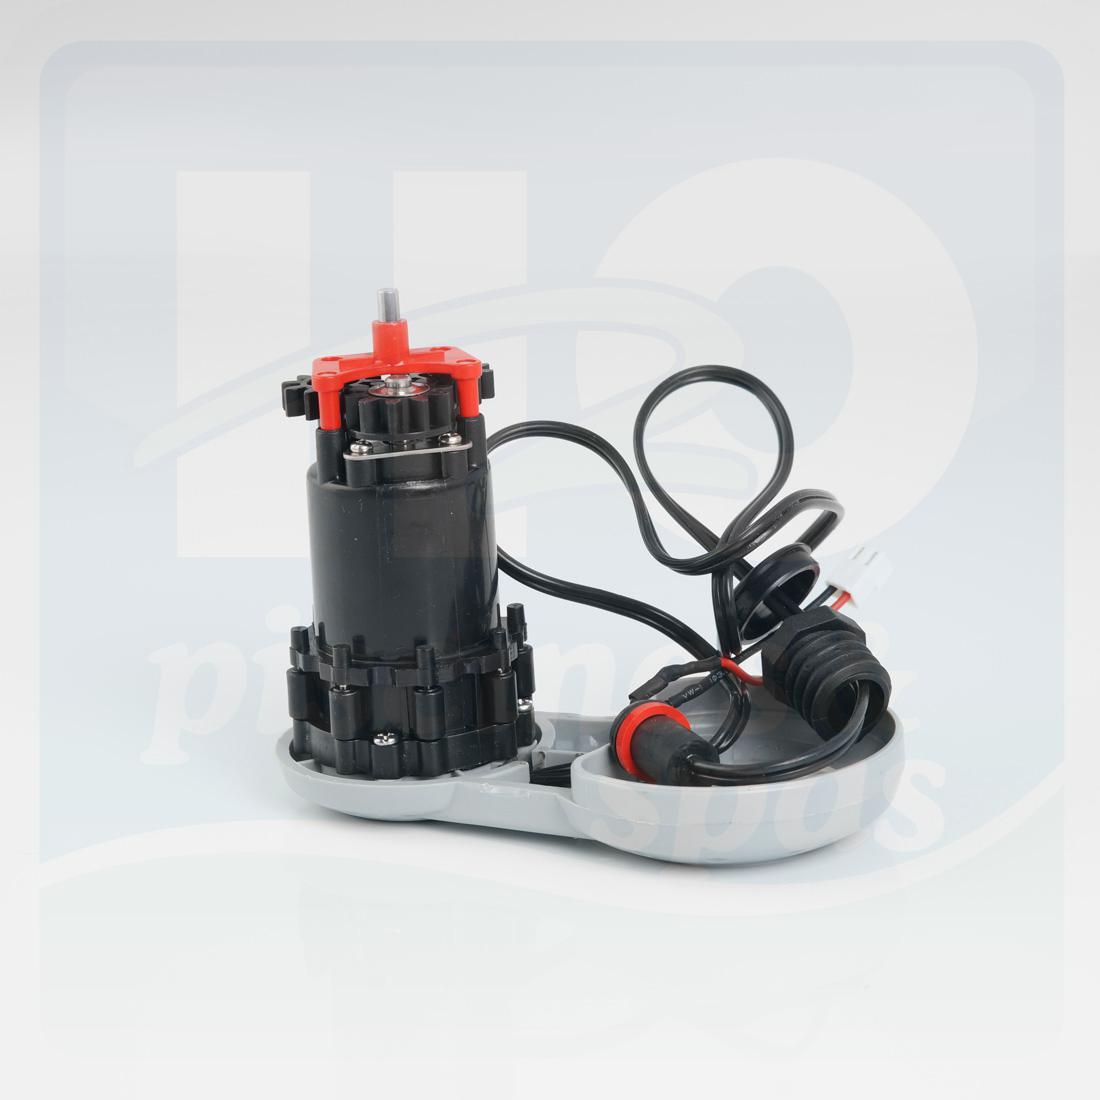 Moteur De Traction Du Robot Smartpool Nitro H2o Piscines Spas